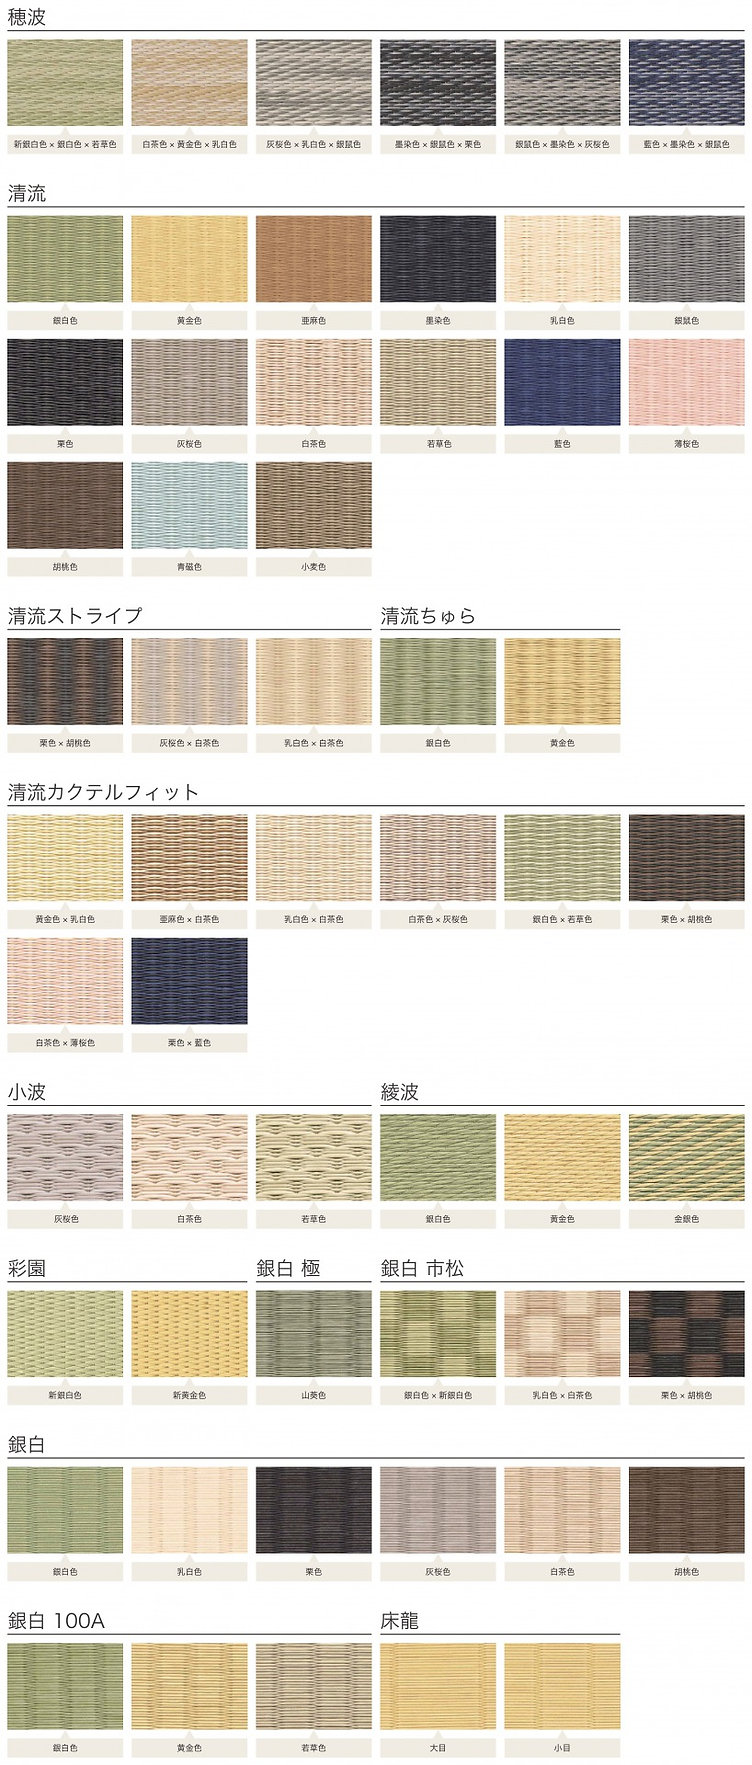 藤吉畳店,和紙畳,和紙表,カラー畳,DAIKEN